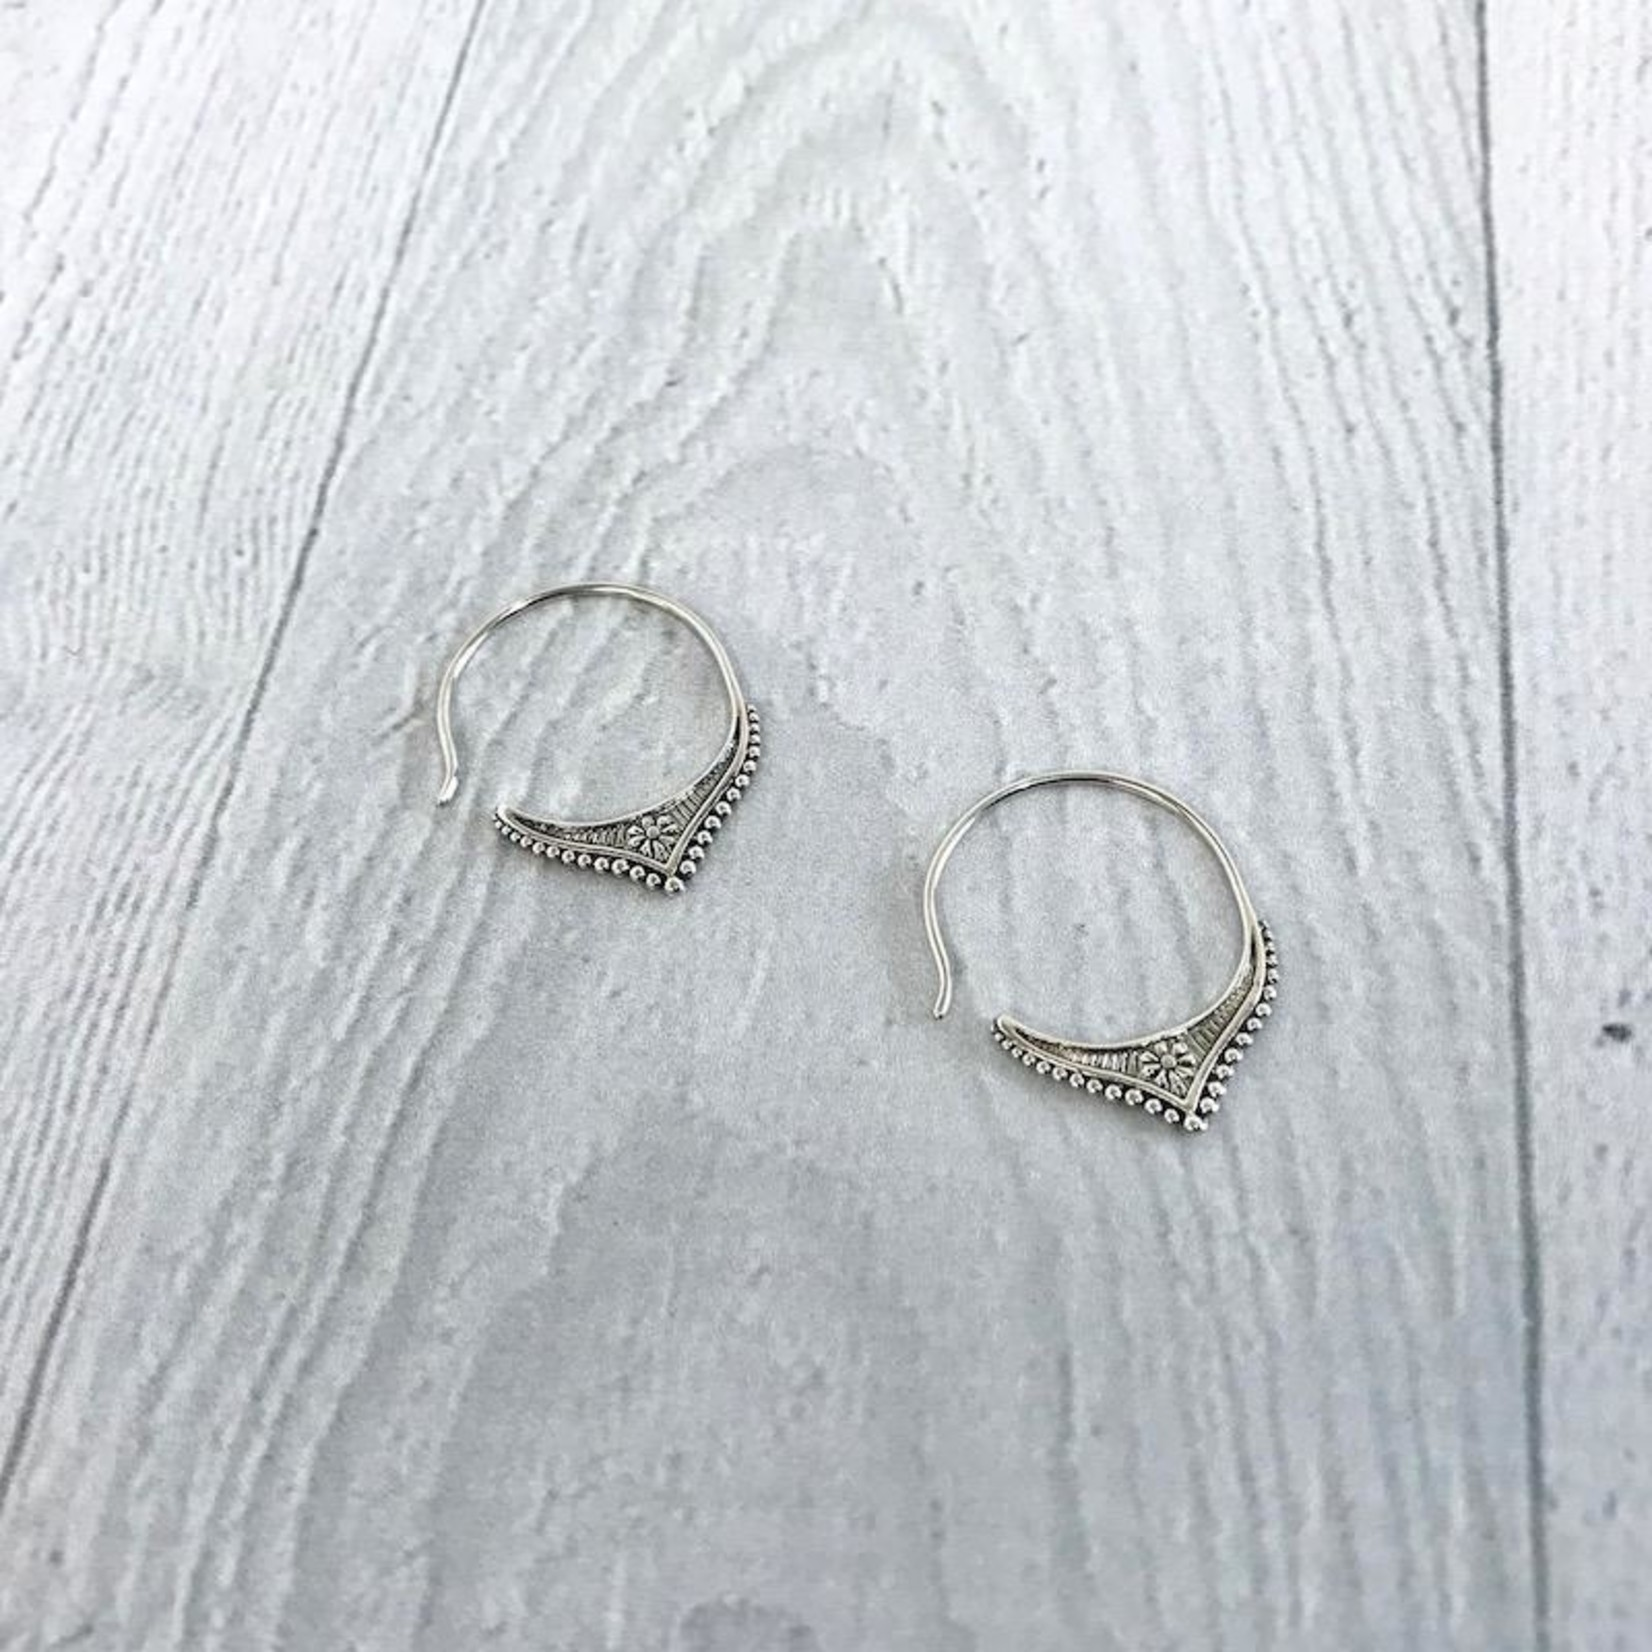 Sterling Silver Hoop Earrings with Filigree Points